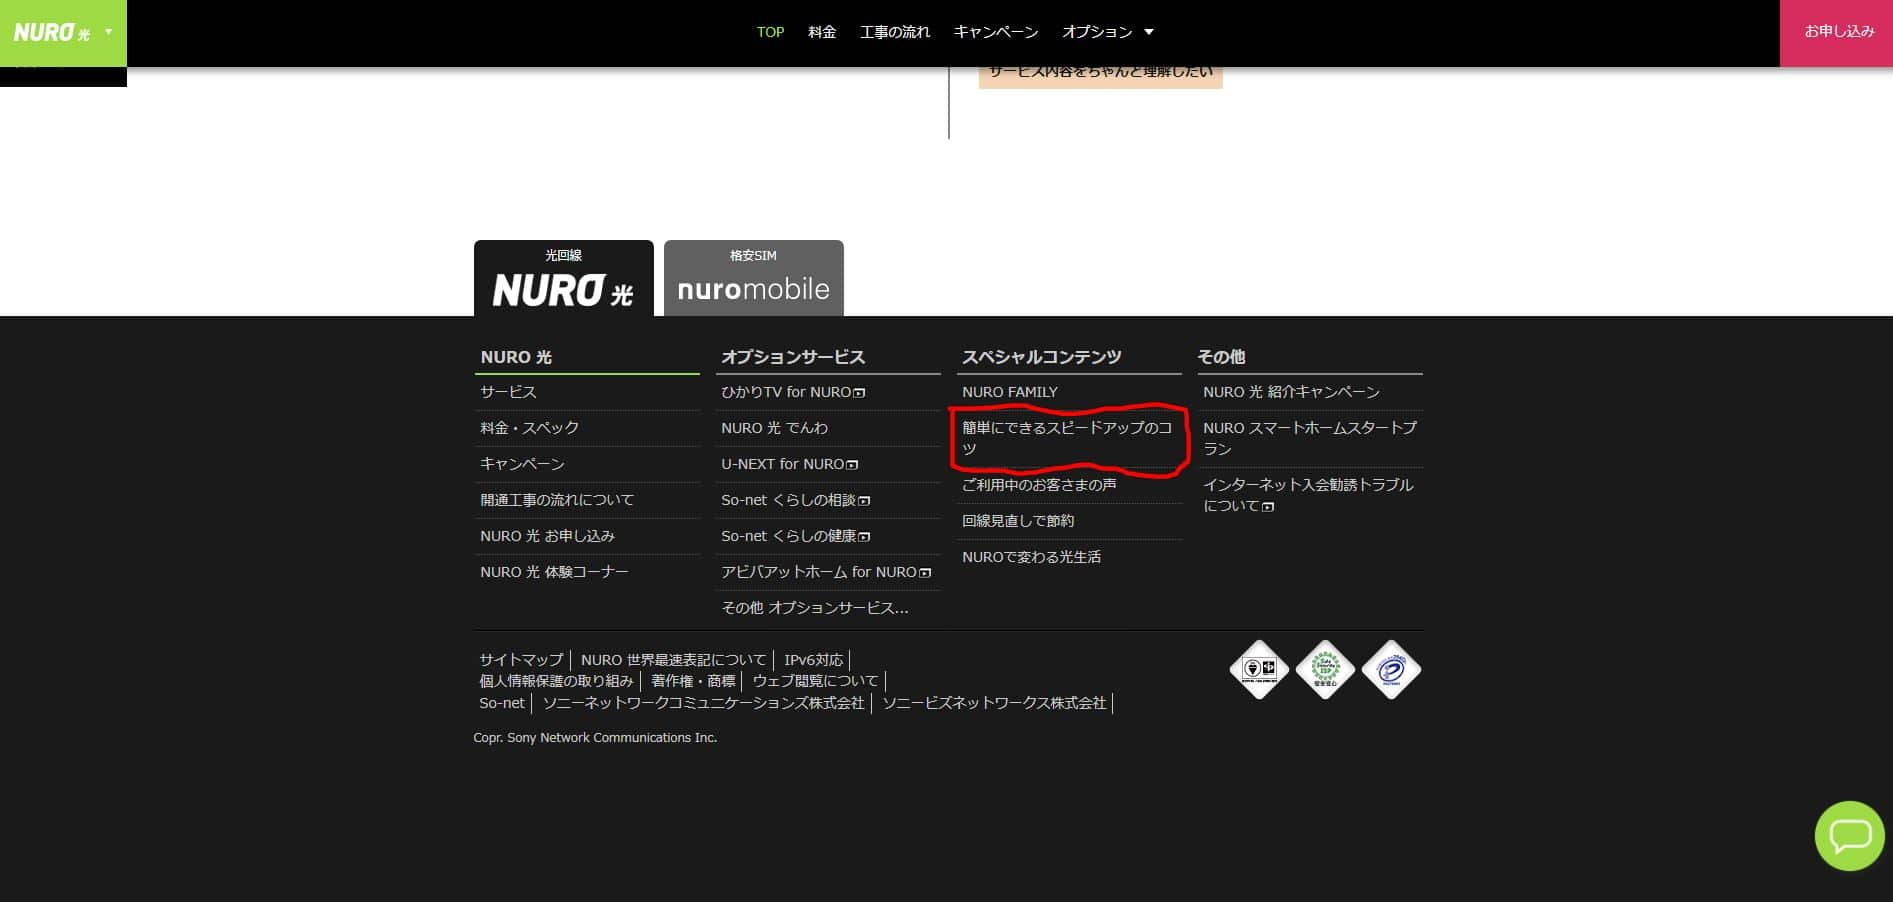 NURO光公式サイト 速度測定02